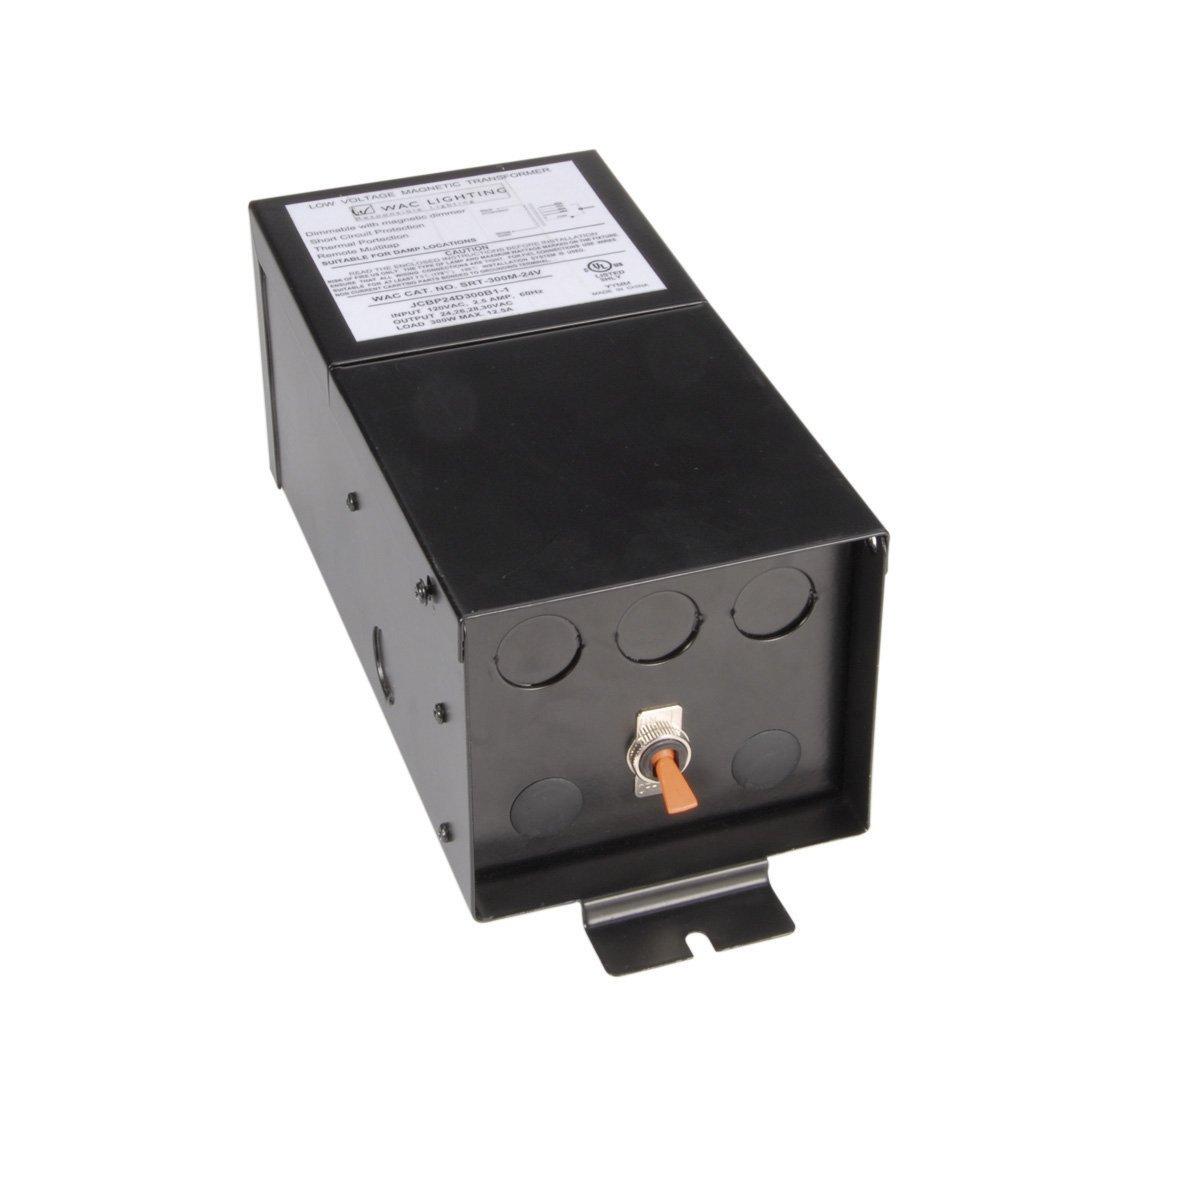 WAC Lighting SRT-300M-24V Remote Magnetic Transformer, 12V by WAC Lighting